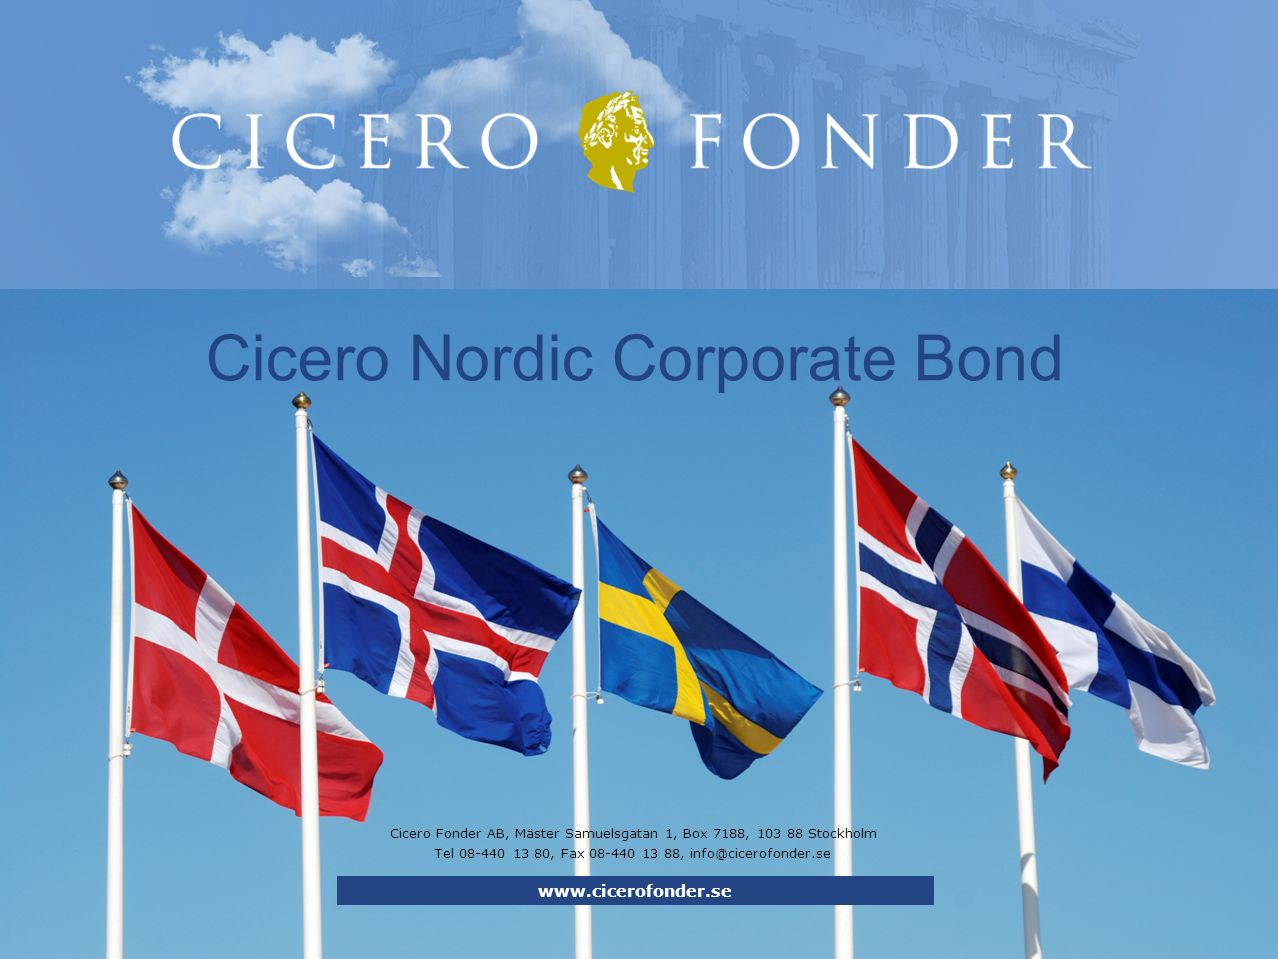 Cicero Fonder AB, Mäster Samuelsgatan 1, Box 7188, 103 88 Stockholm Tel 08-440 13 80, Fax 08-440 13 88, info@cicerofonder.se Cicero Nordic Corporate Bond www.cicerofonder.se